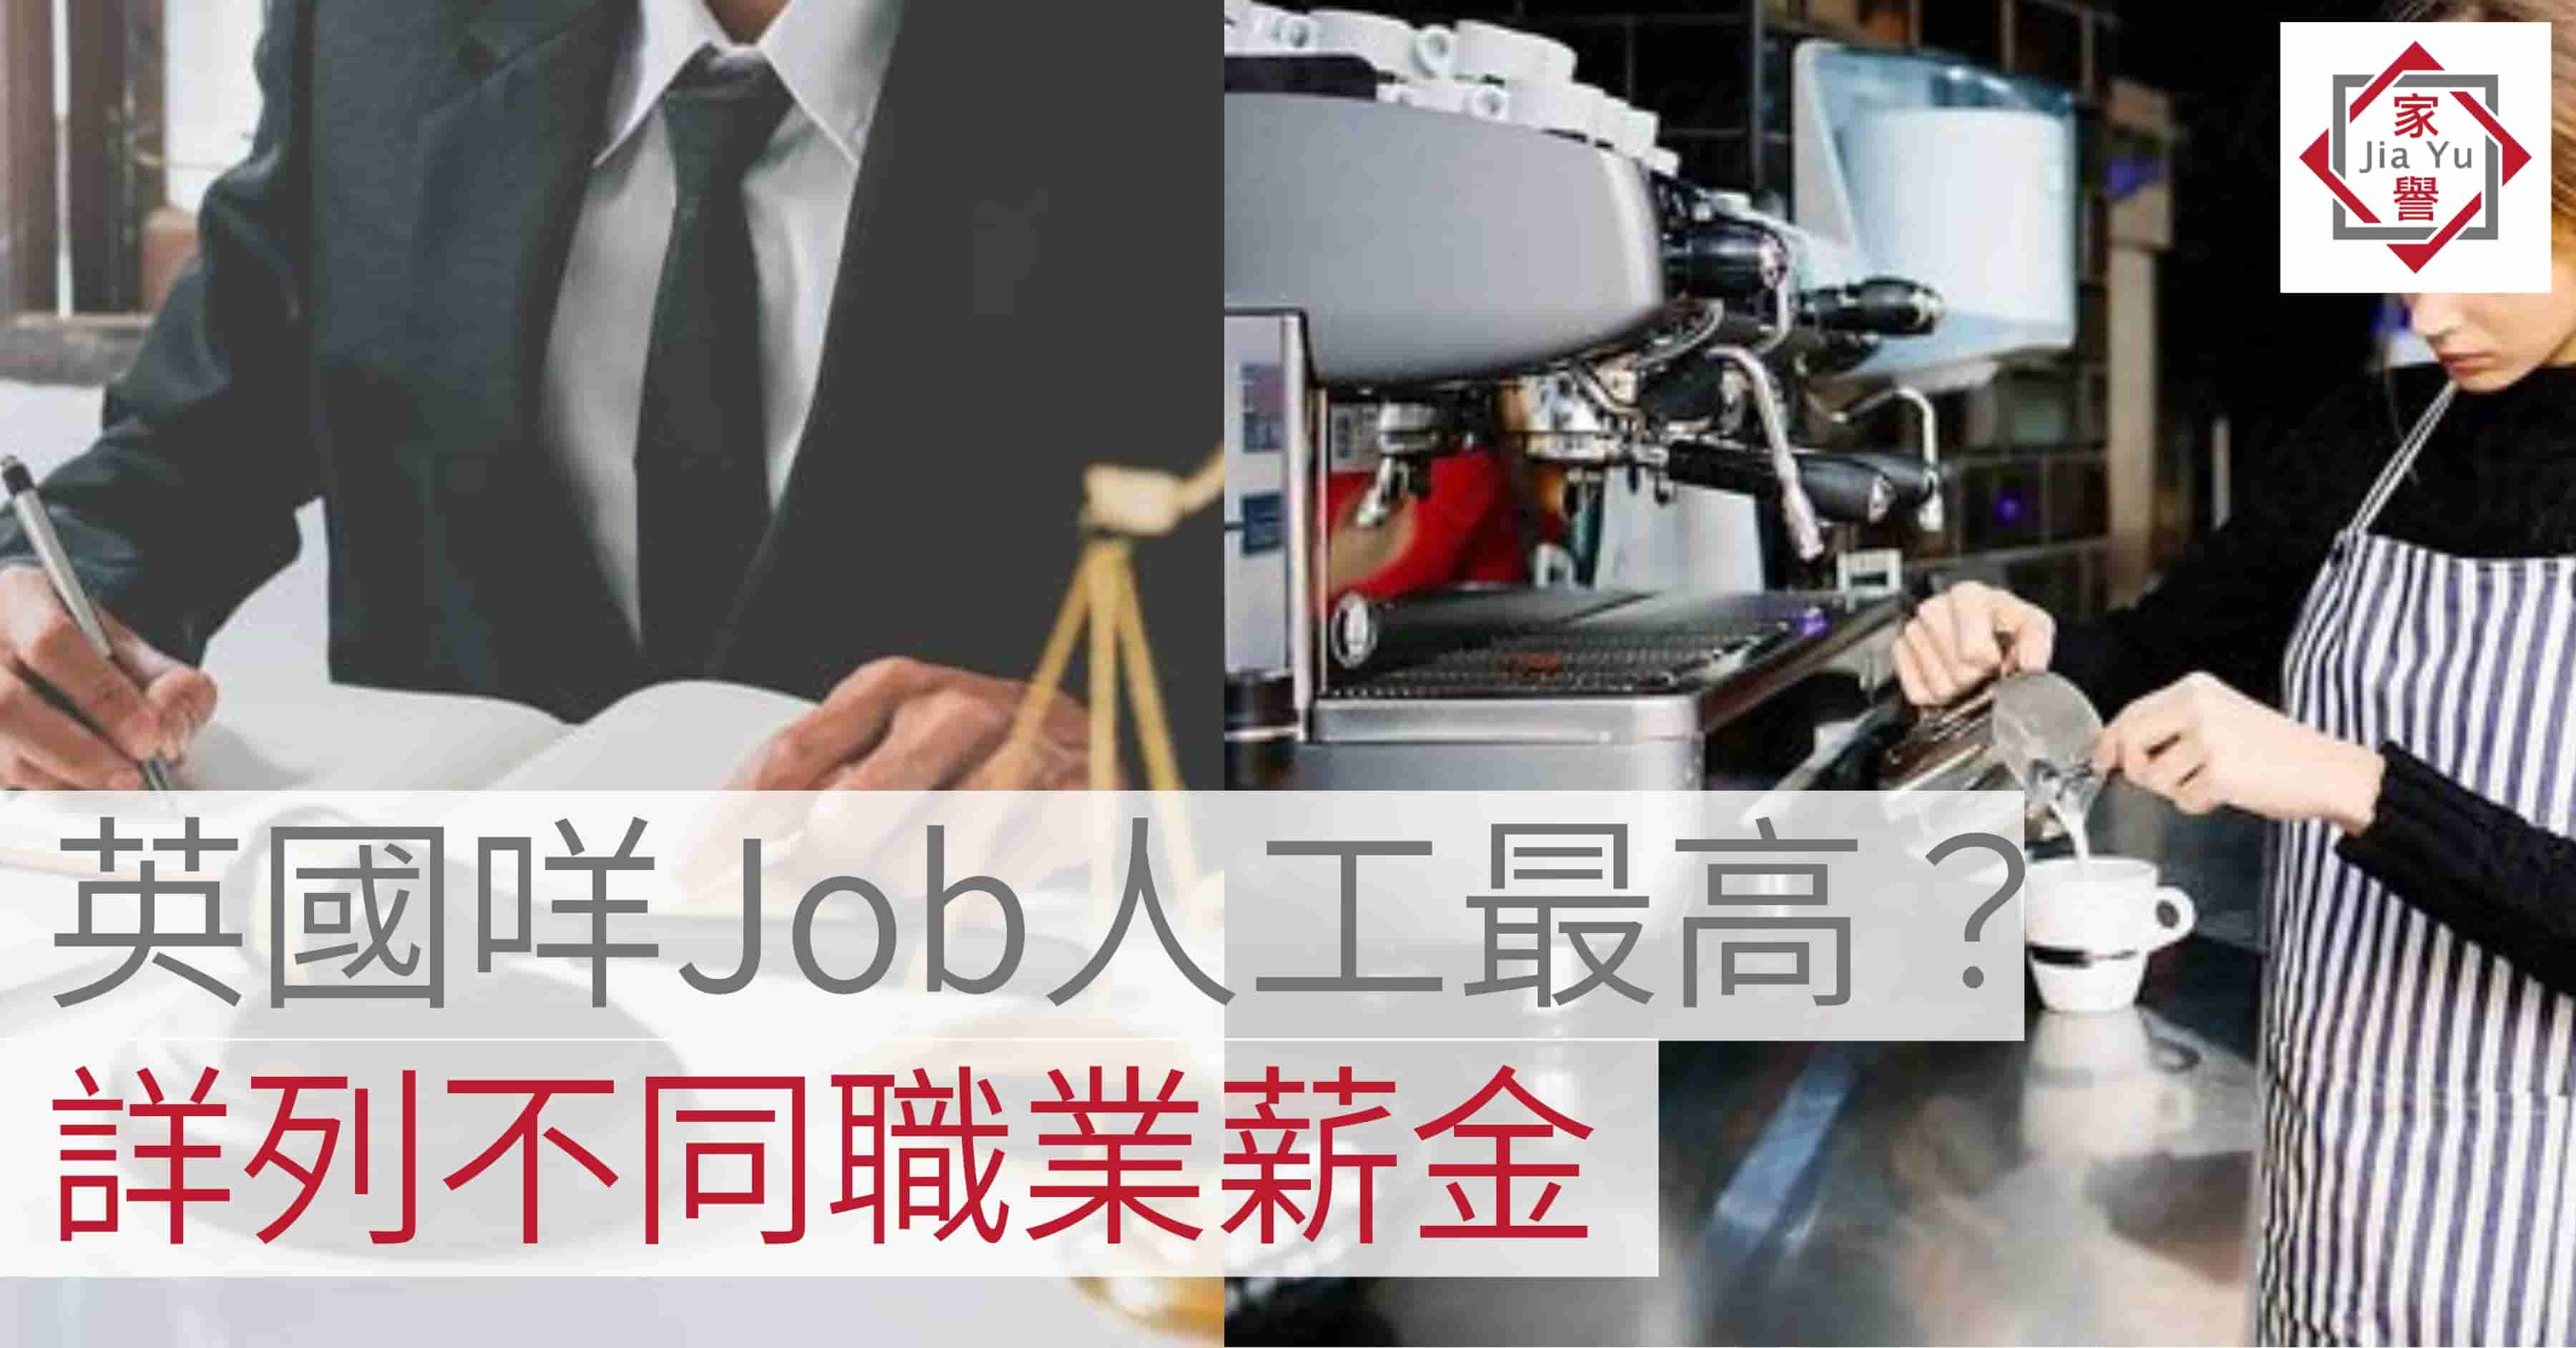 The Highest Paying Job in UK | JiaYu